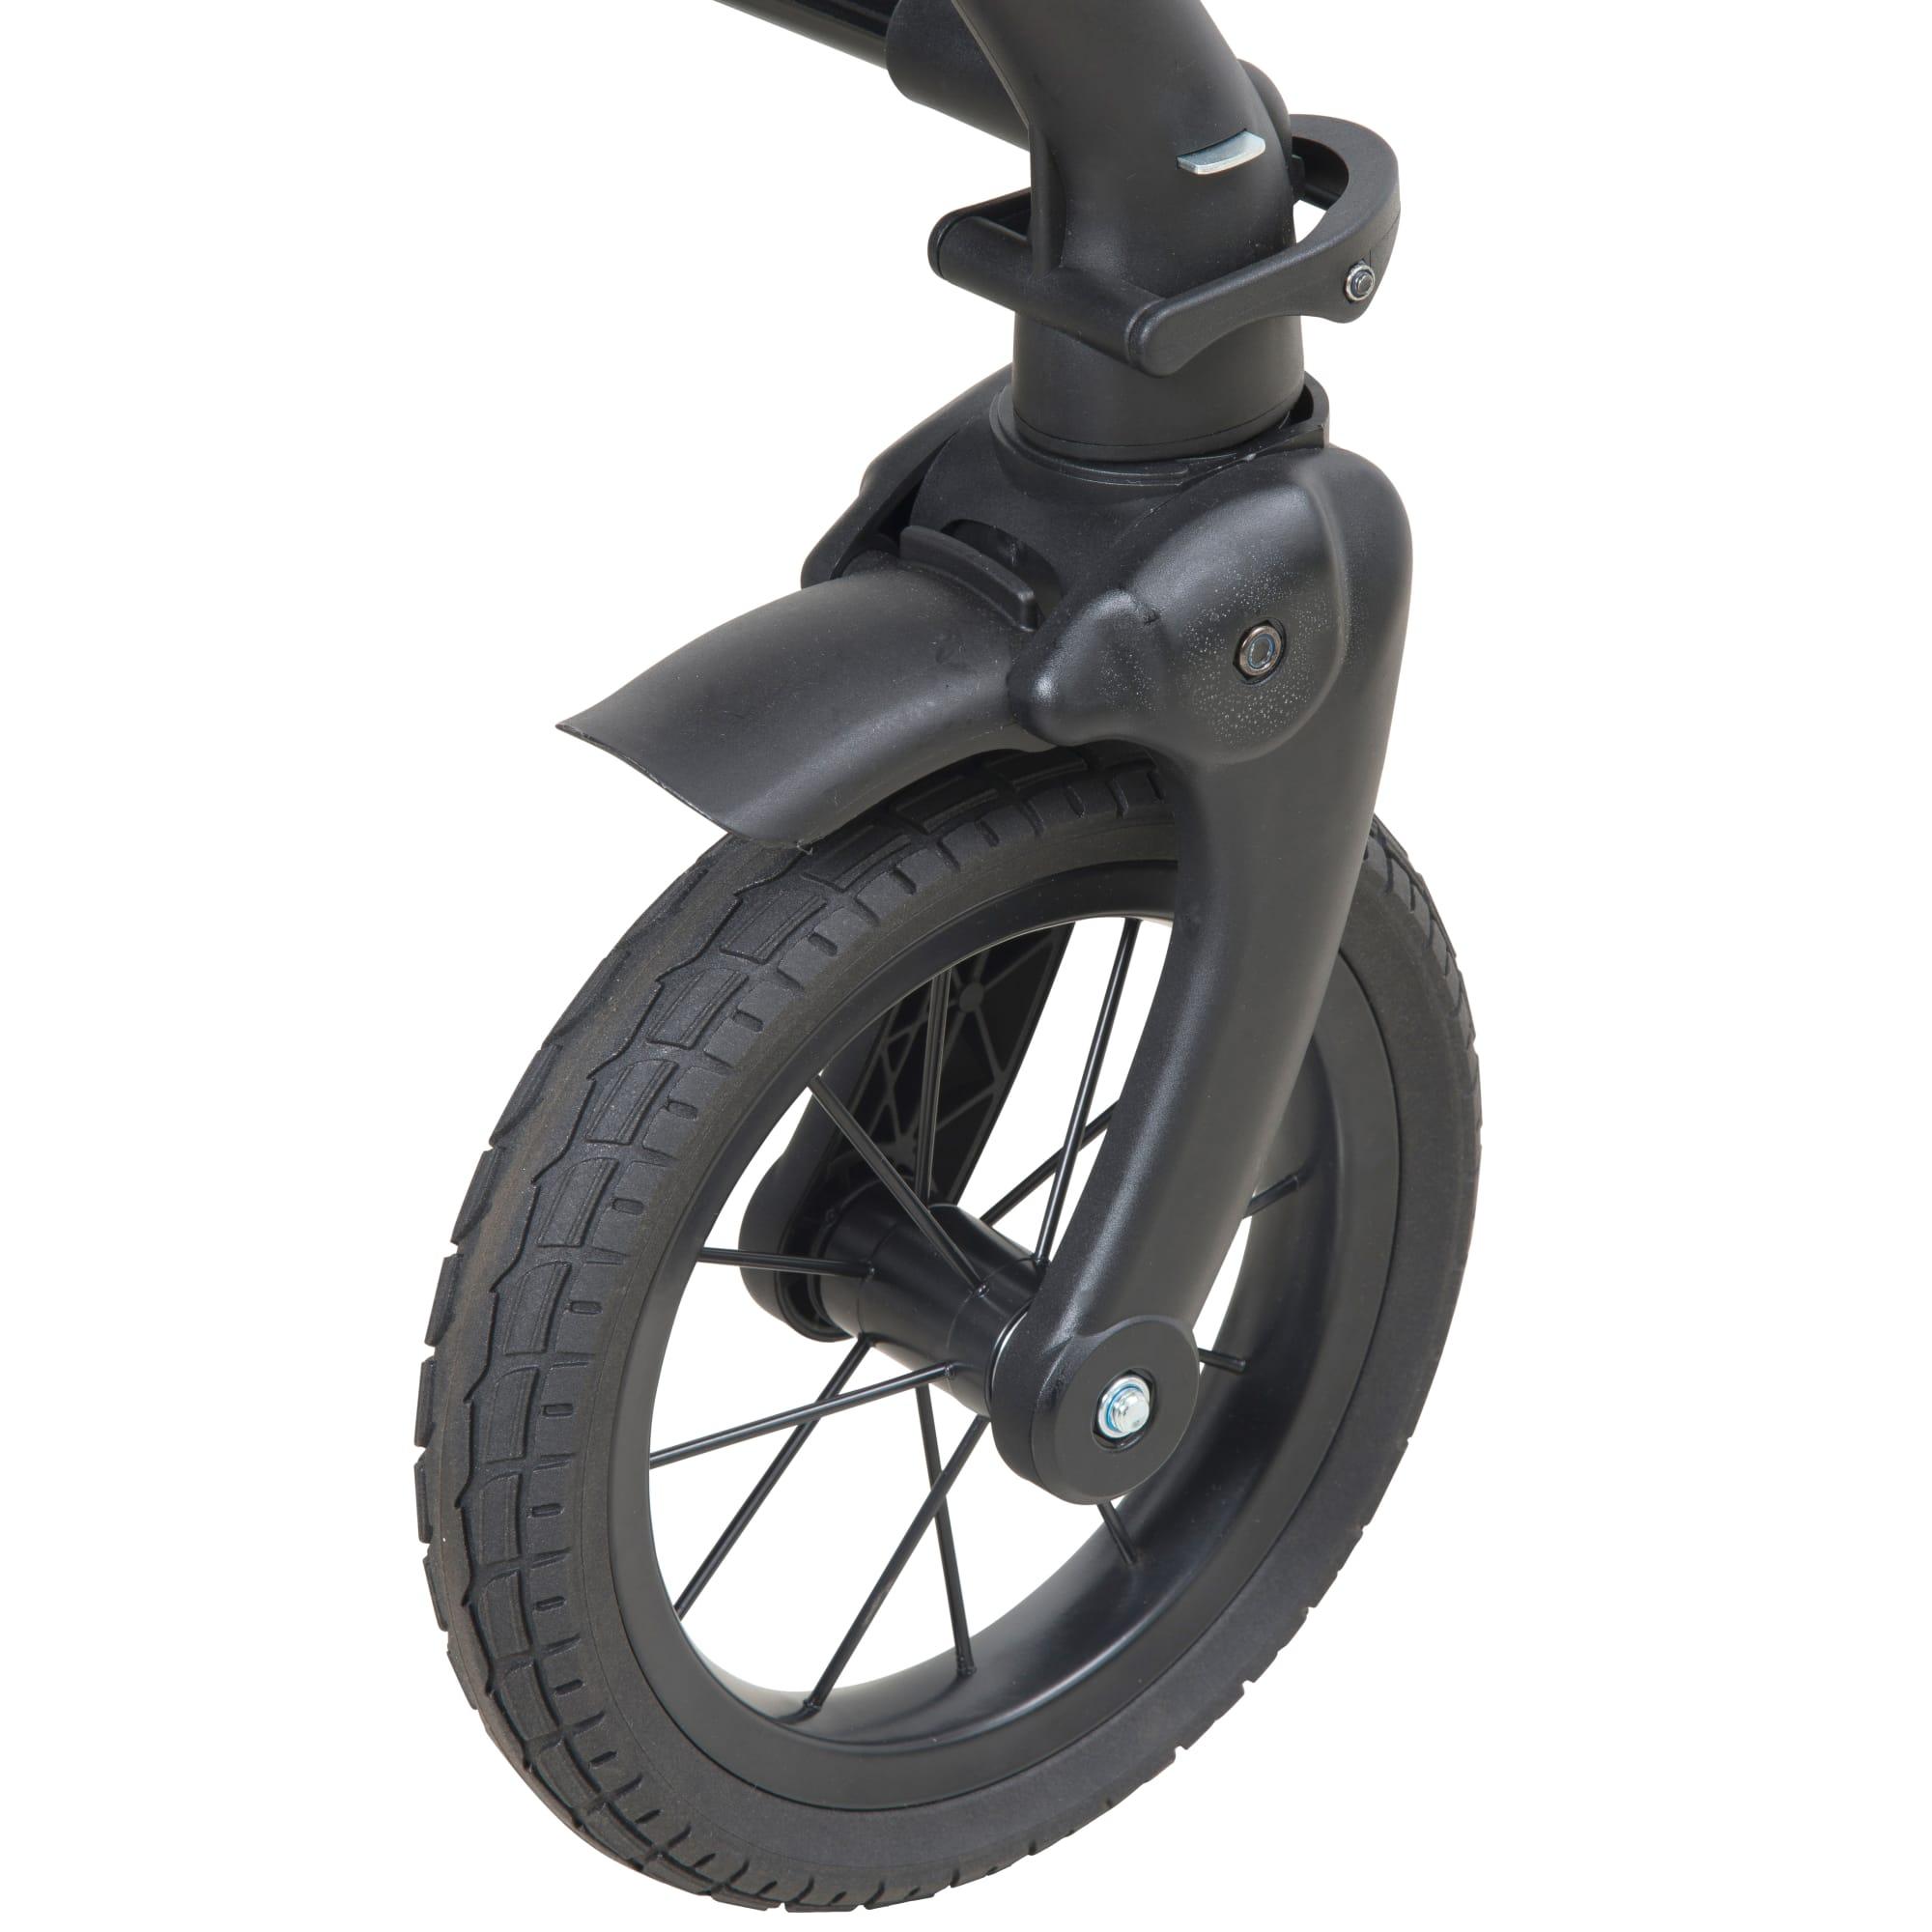 1 stk. punkterfrit, massivt hjul til BabyTrold vogne og Babynor Ydun